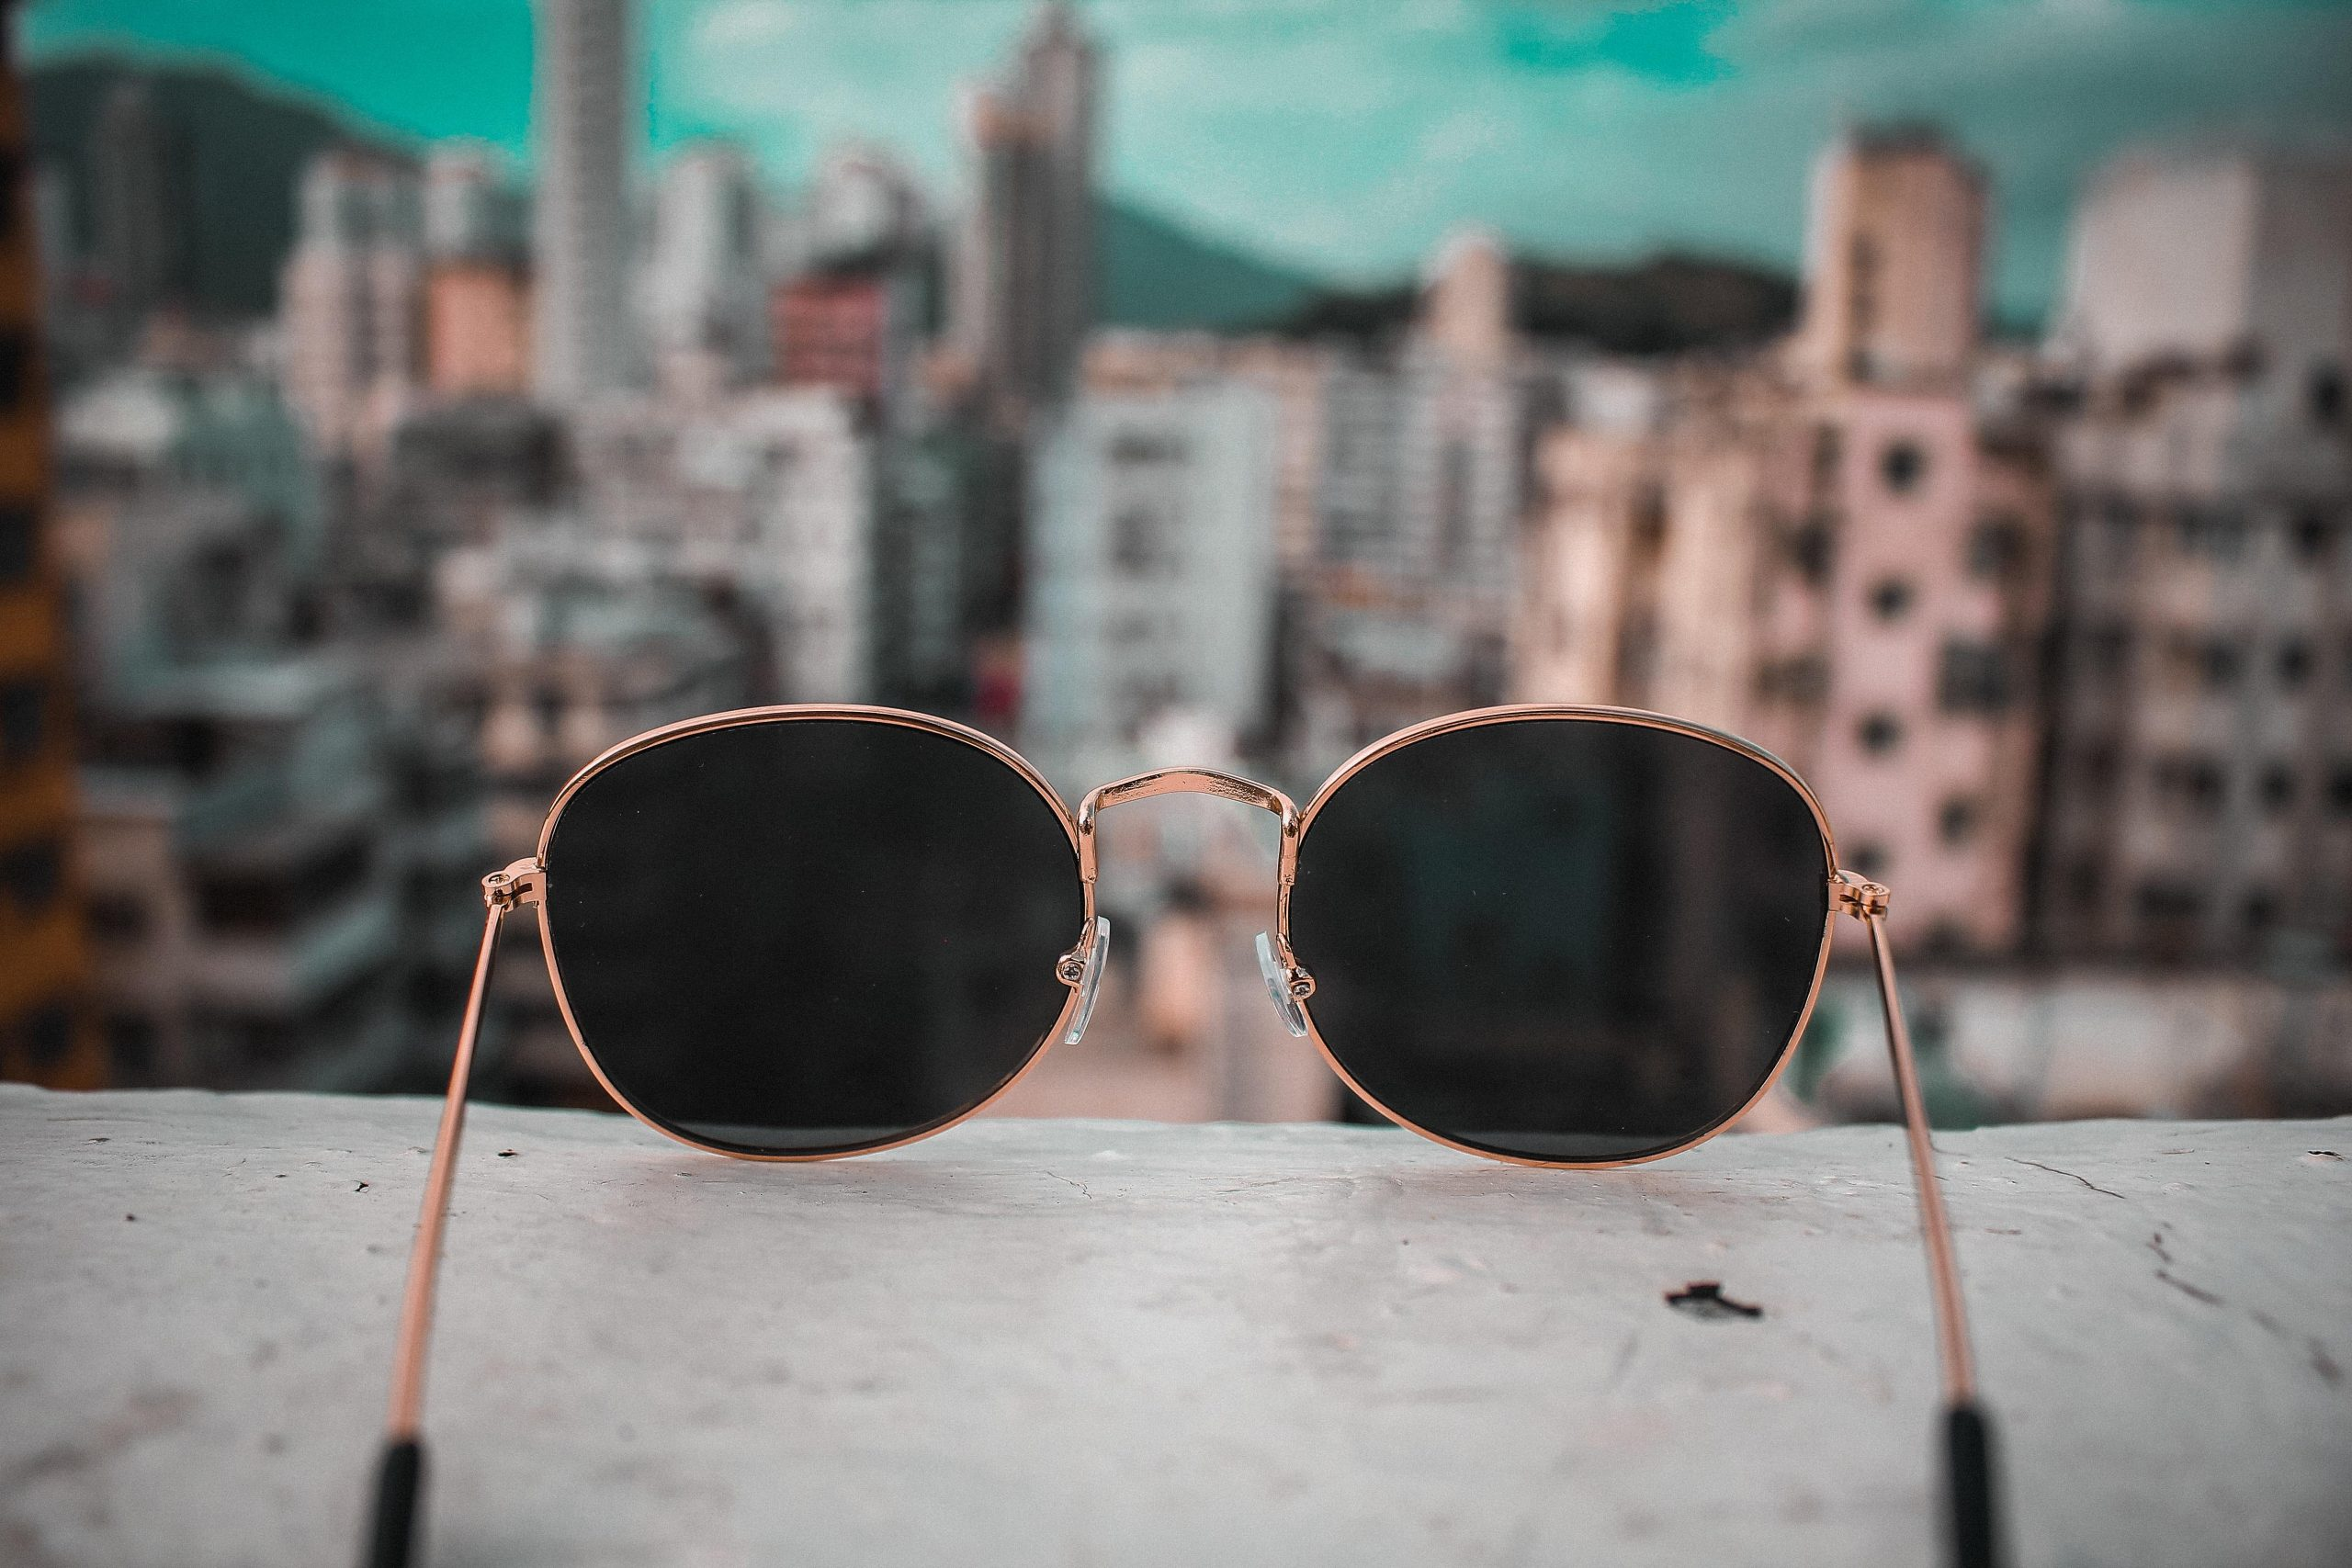 gafasdesoltomford-mrsunglass-blogger-influencer-emprendedora1